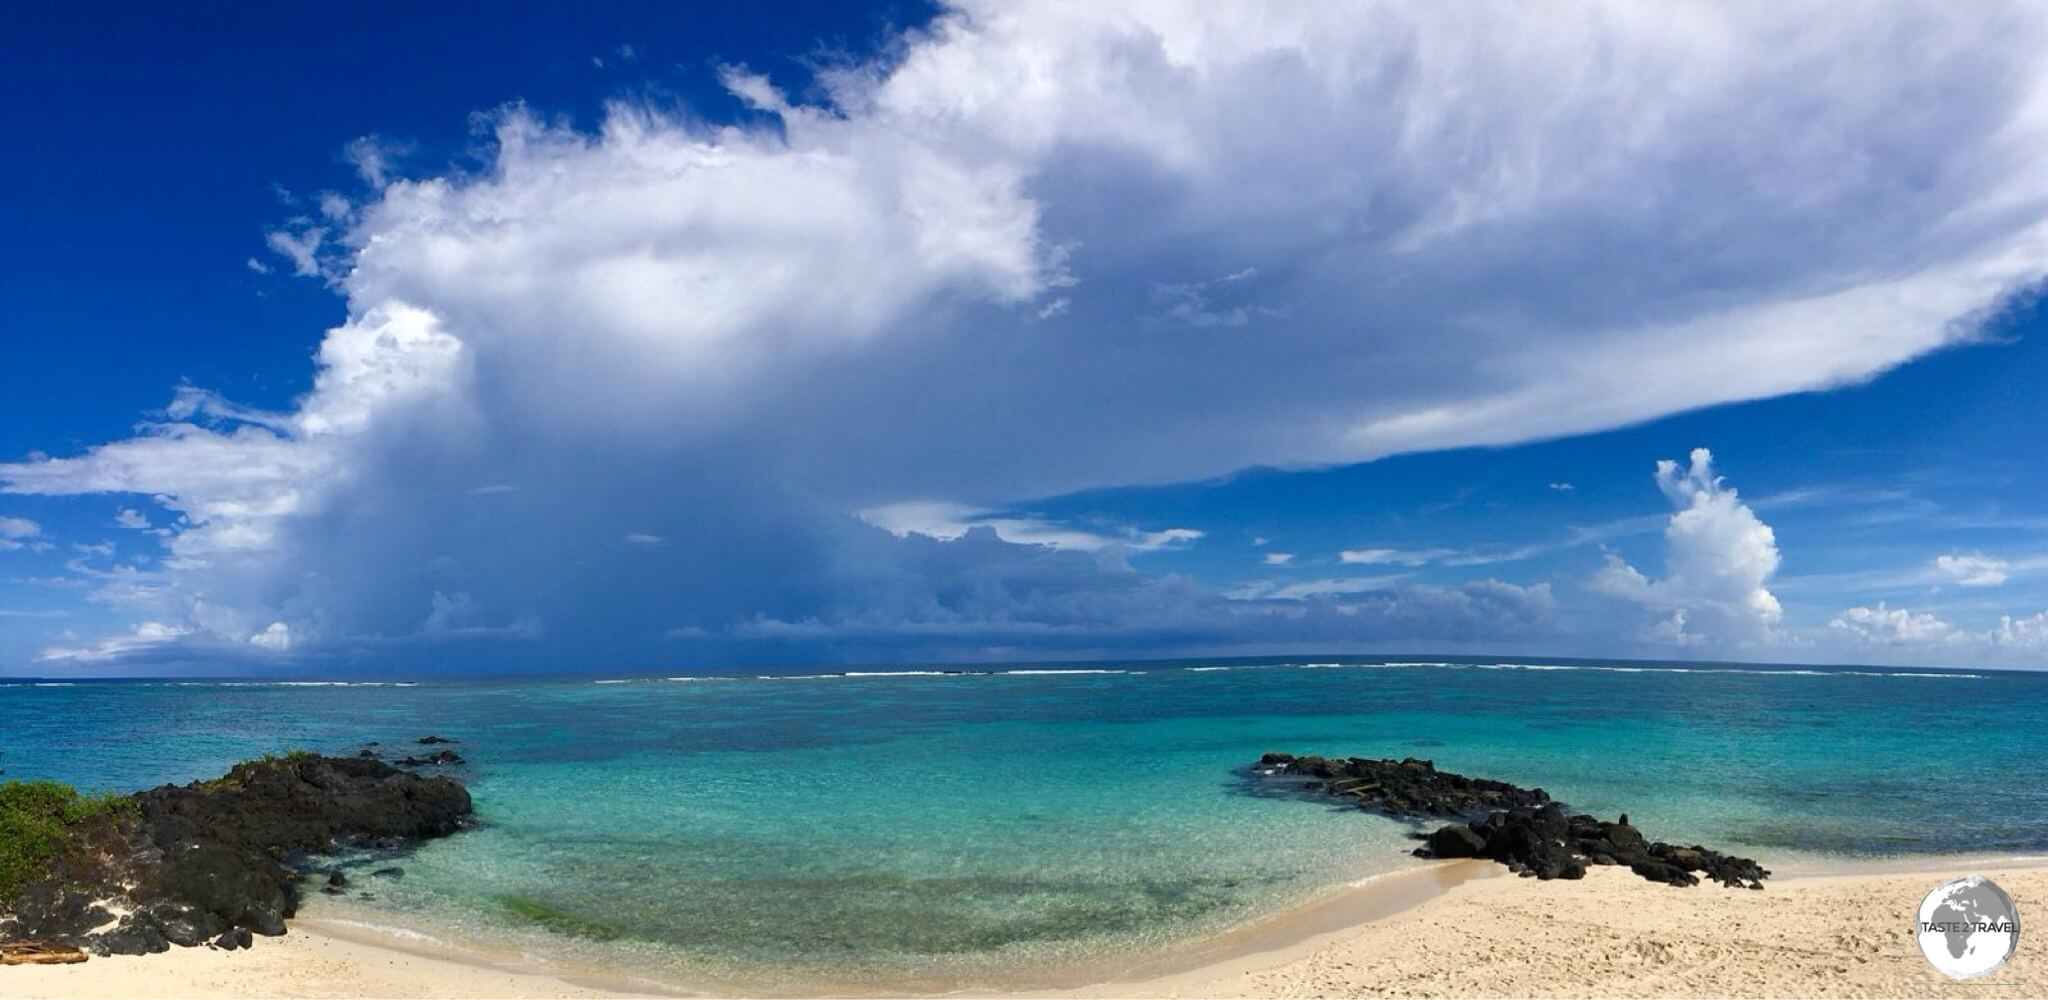 Storm clouds form over Vaisala beach.